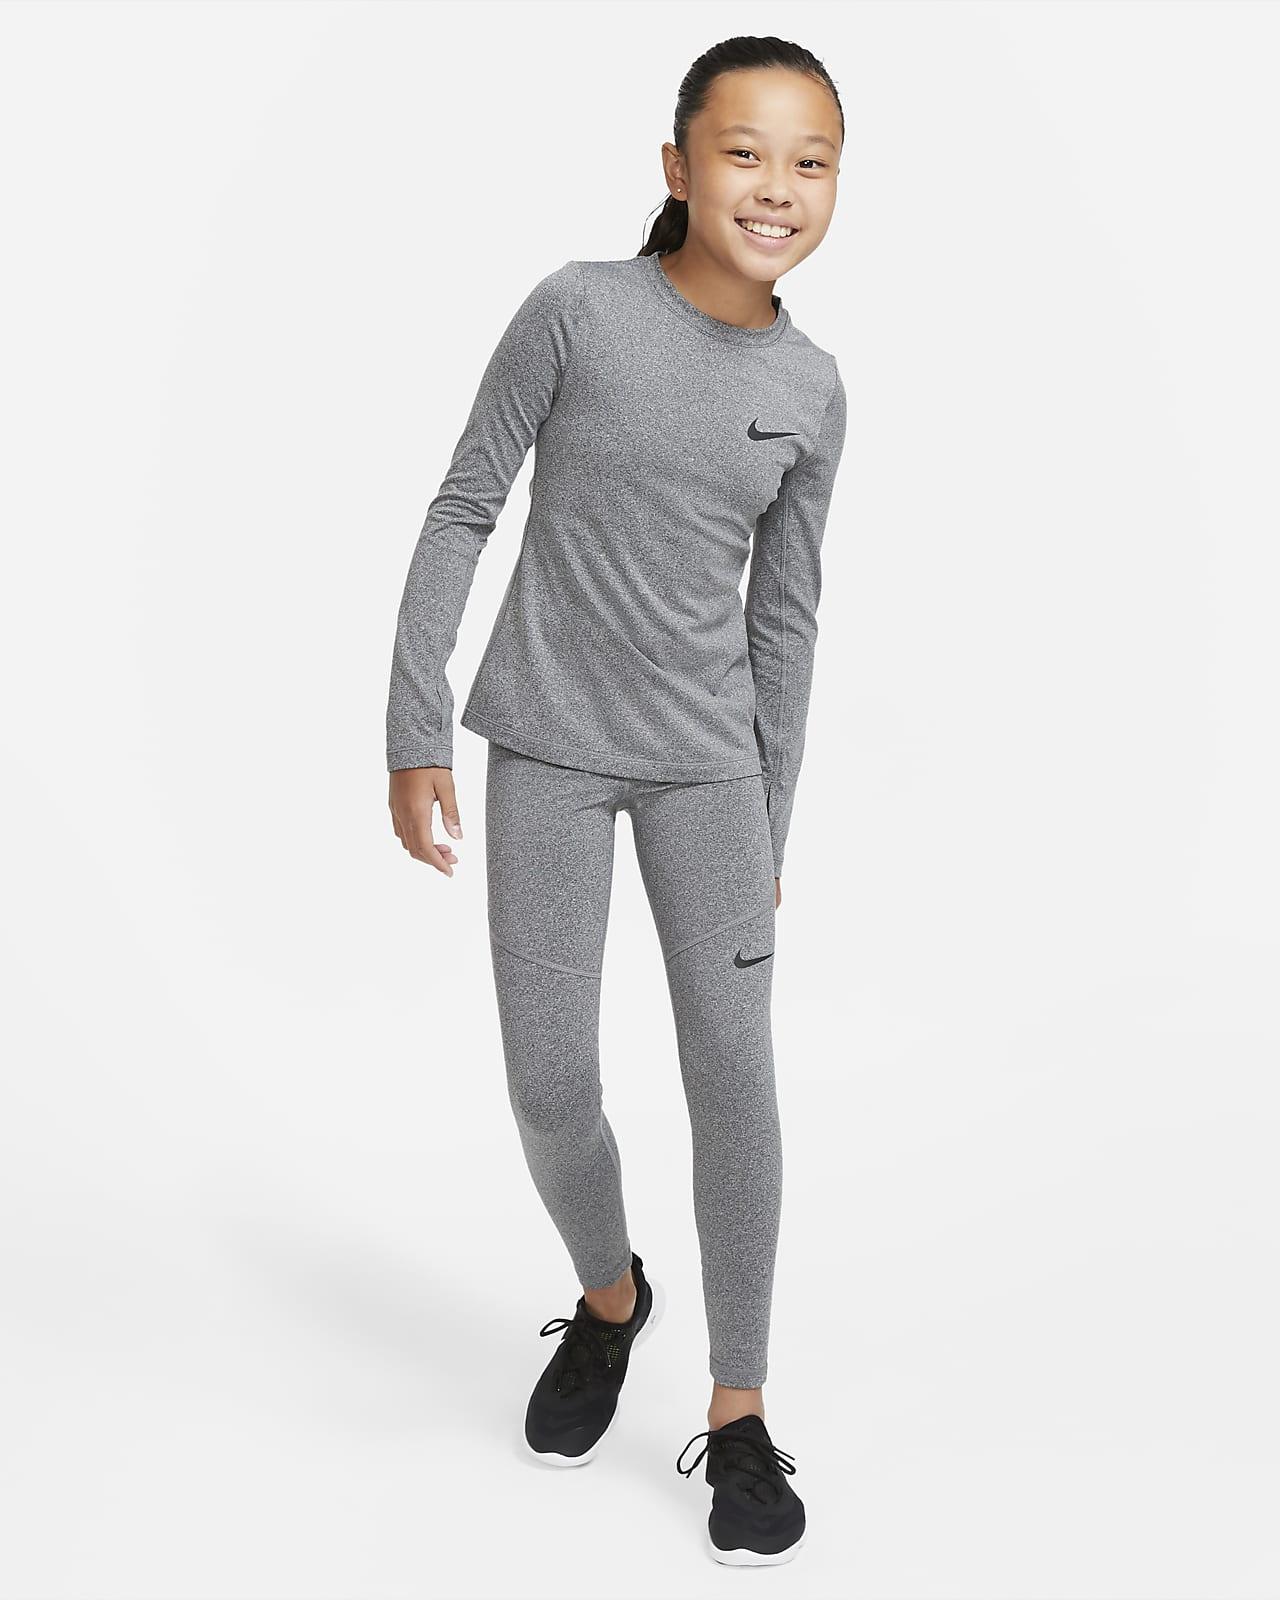 Nike Pro Warm Big Kids' (Girls') Long-Sleeve Top